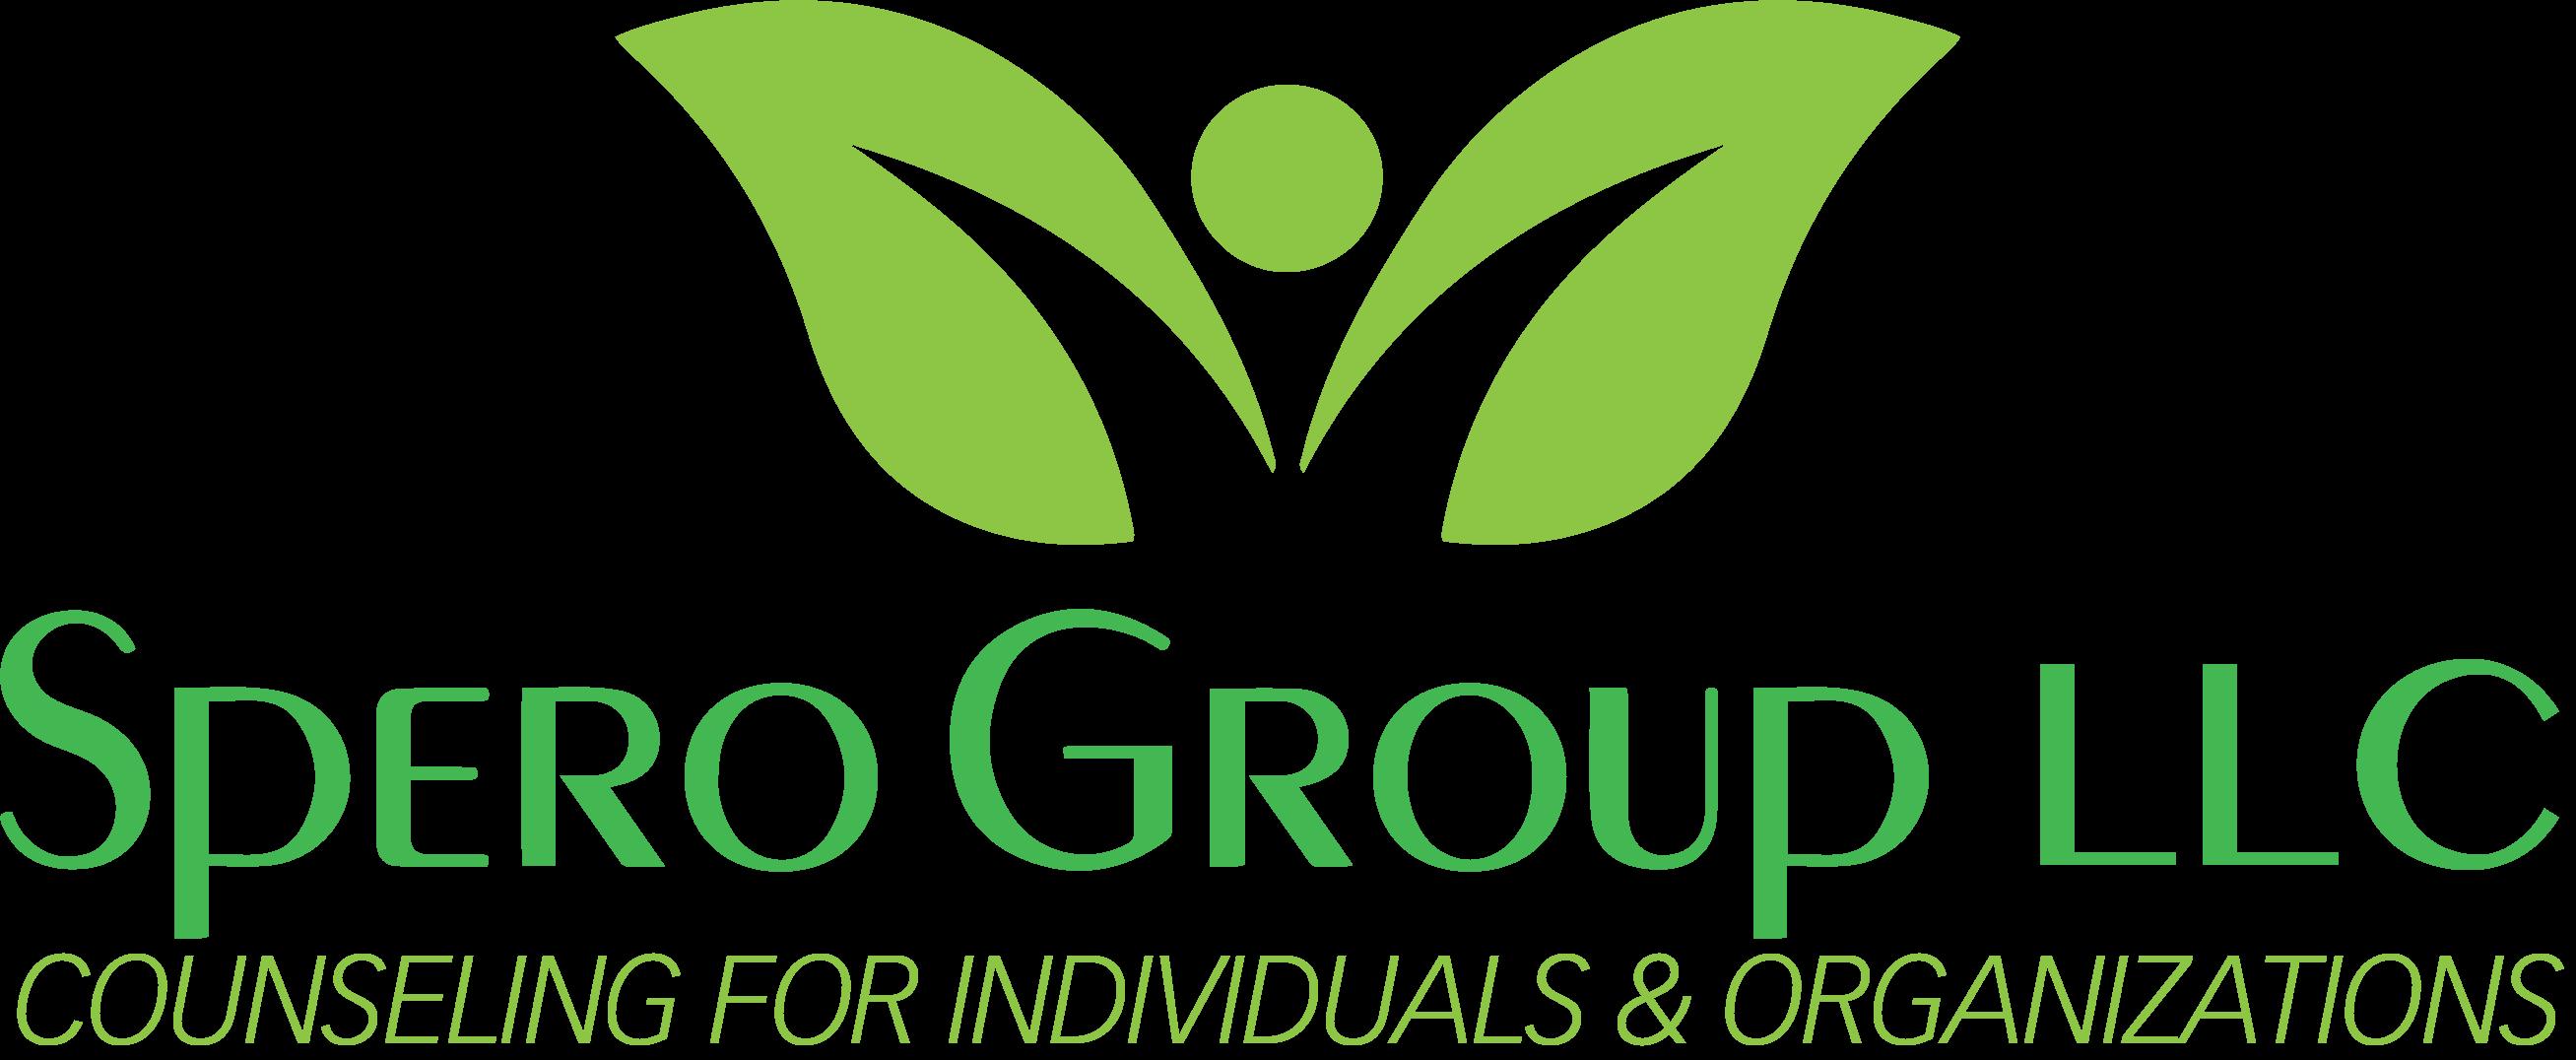 Spero Group LLC